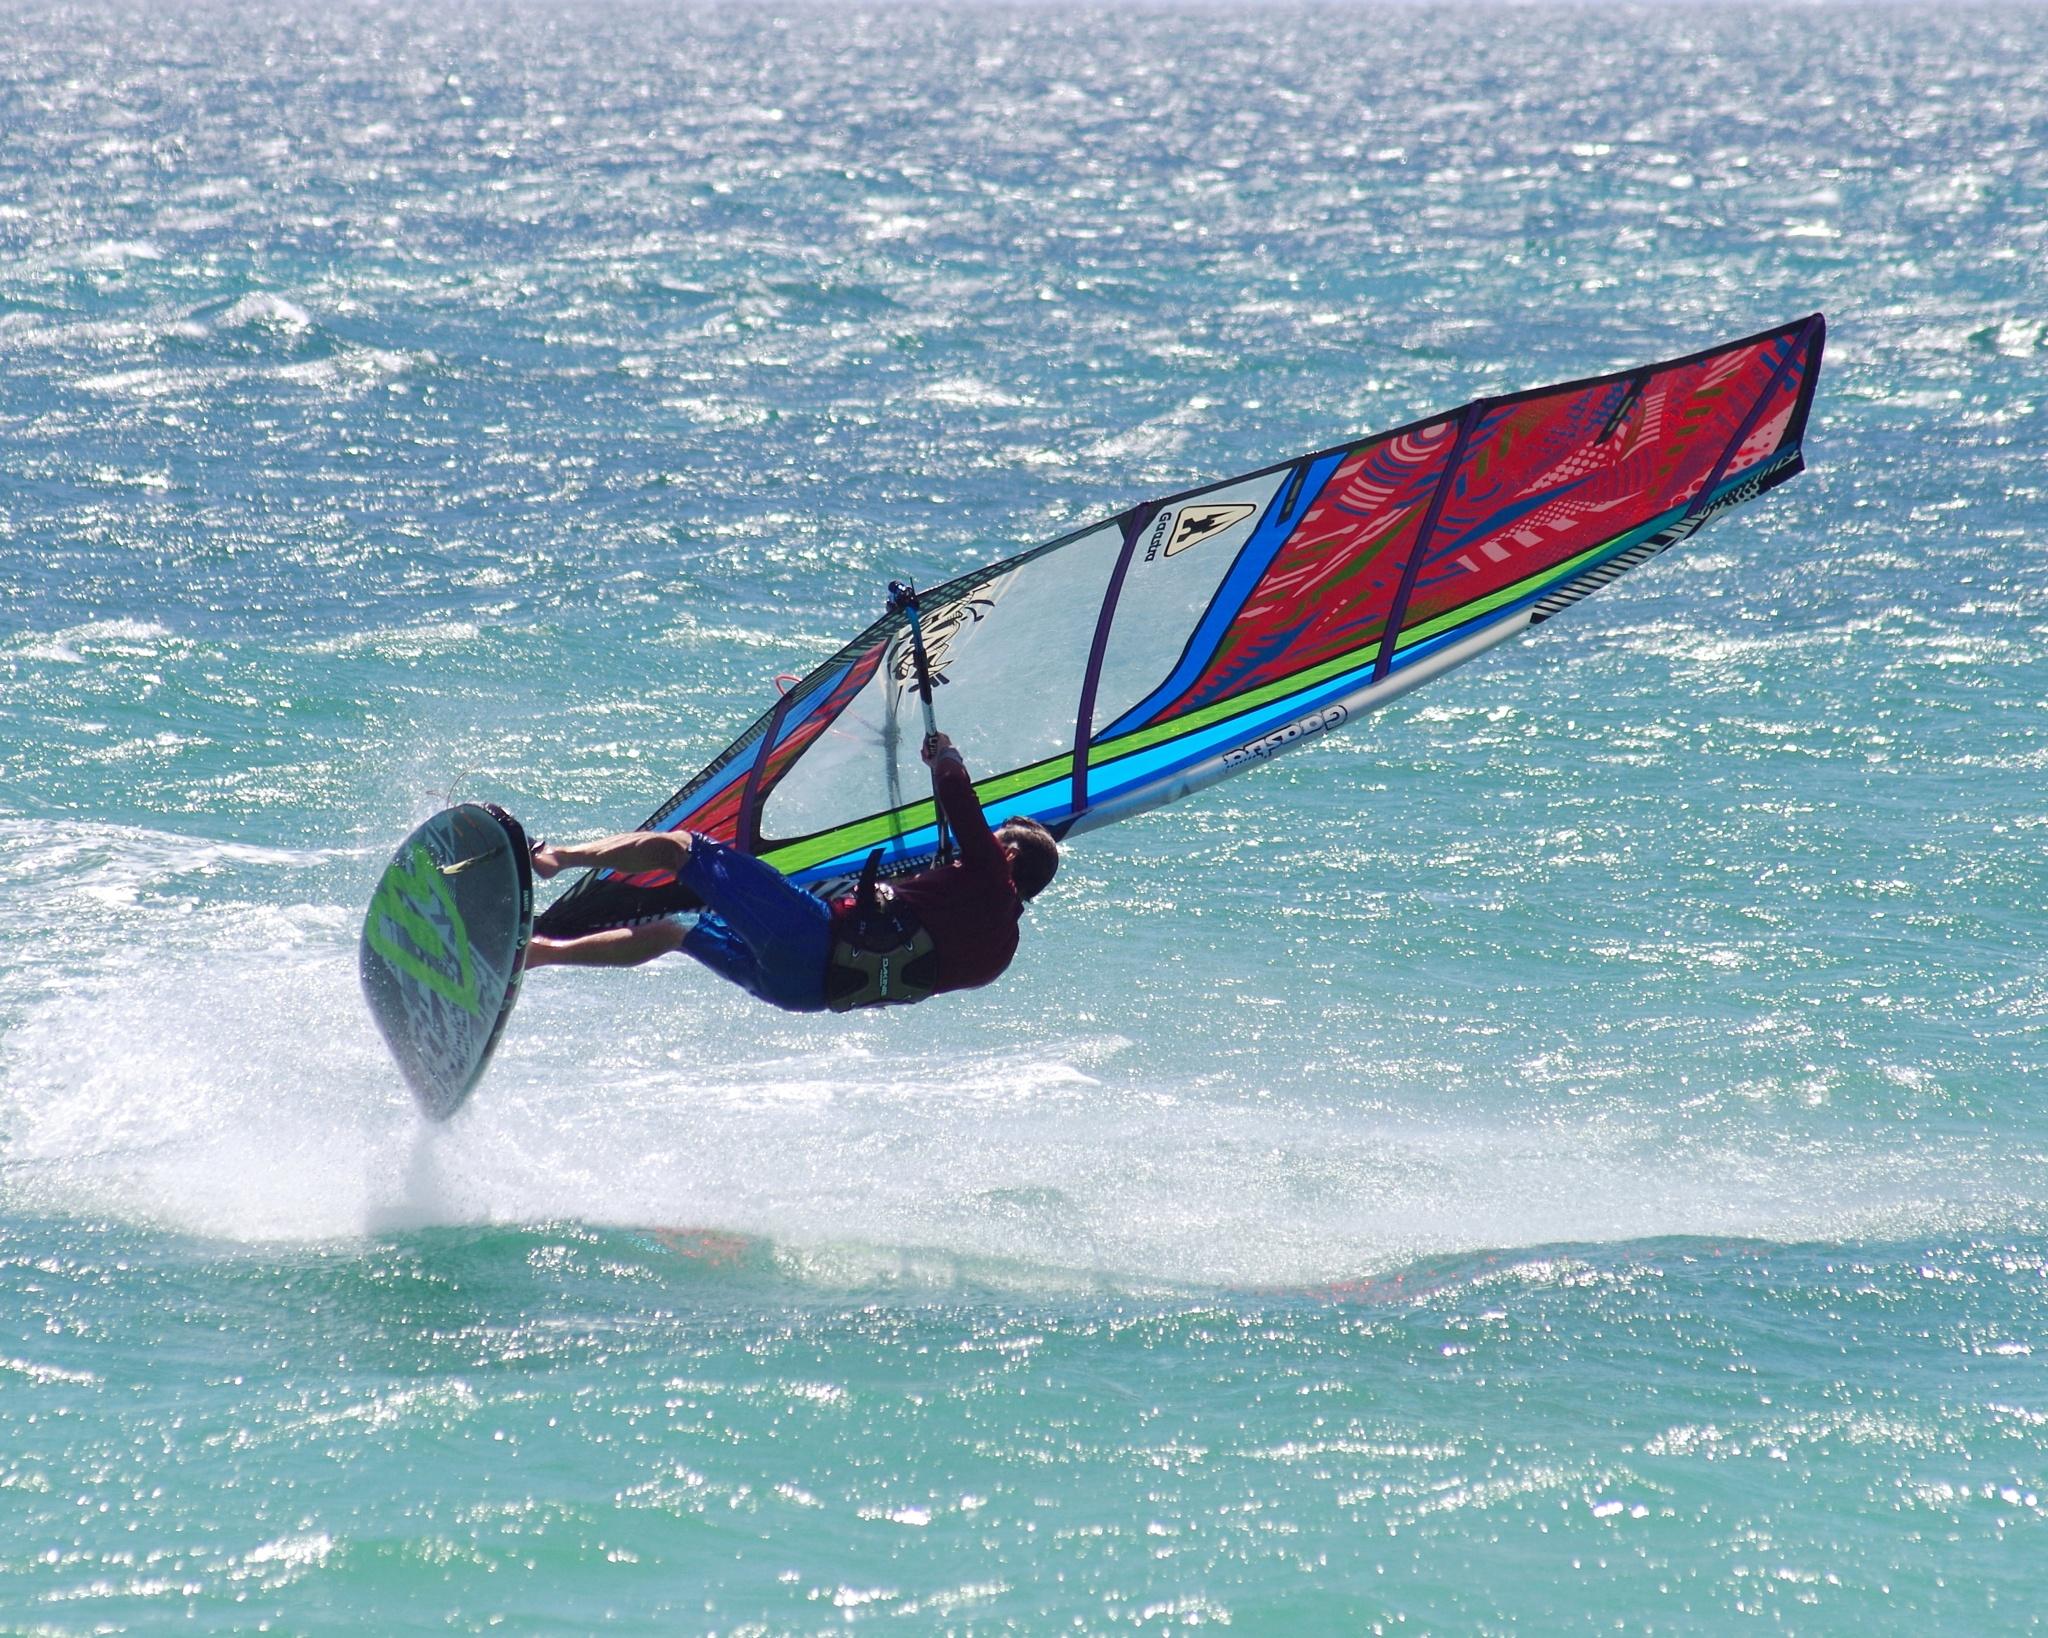 windsurfer action shot 2 by cinzia.sawatzky